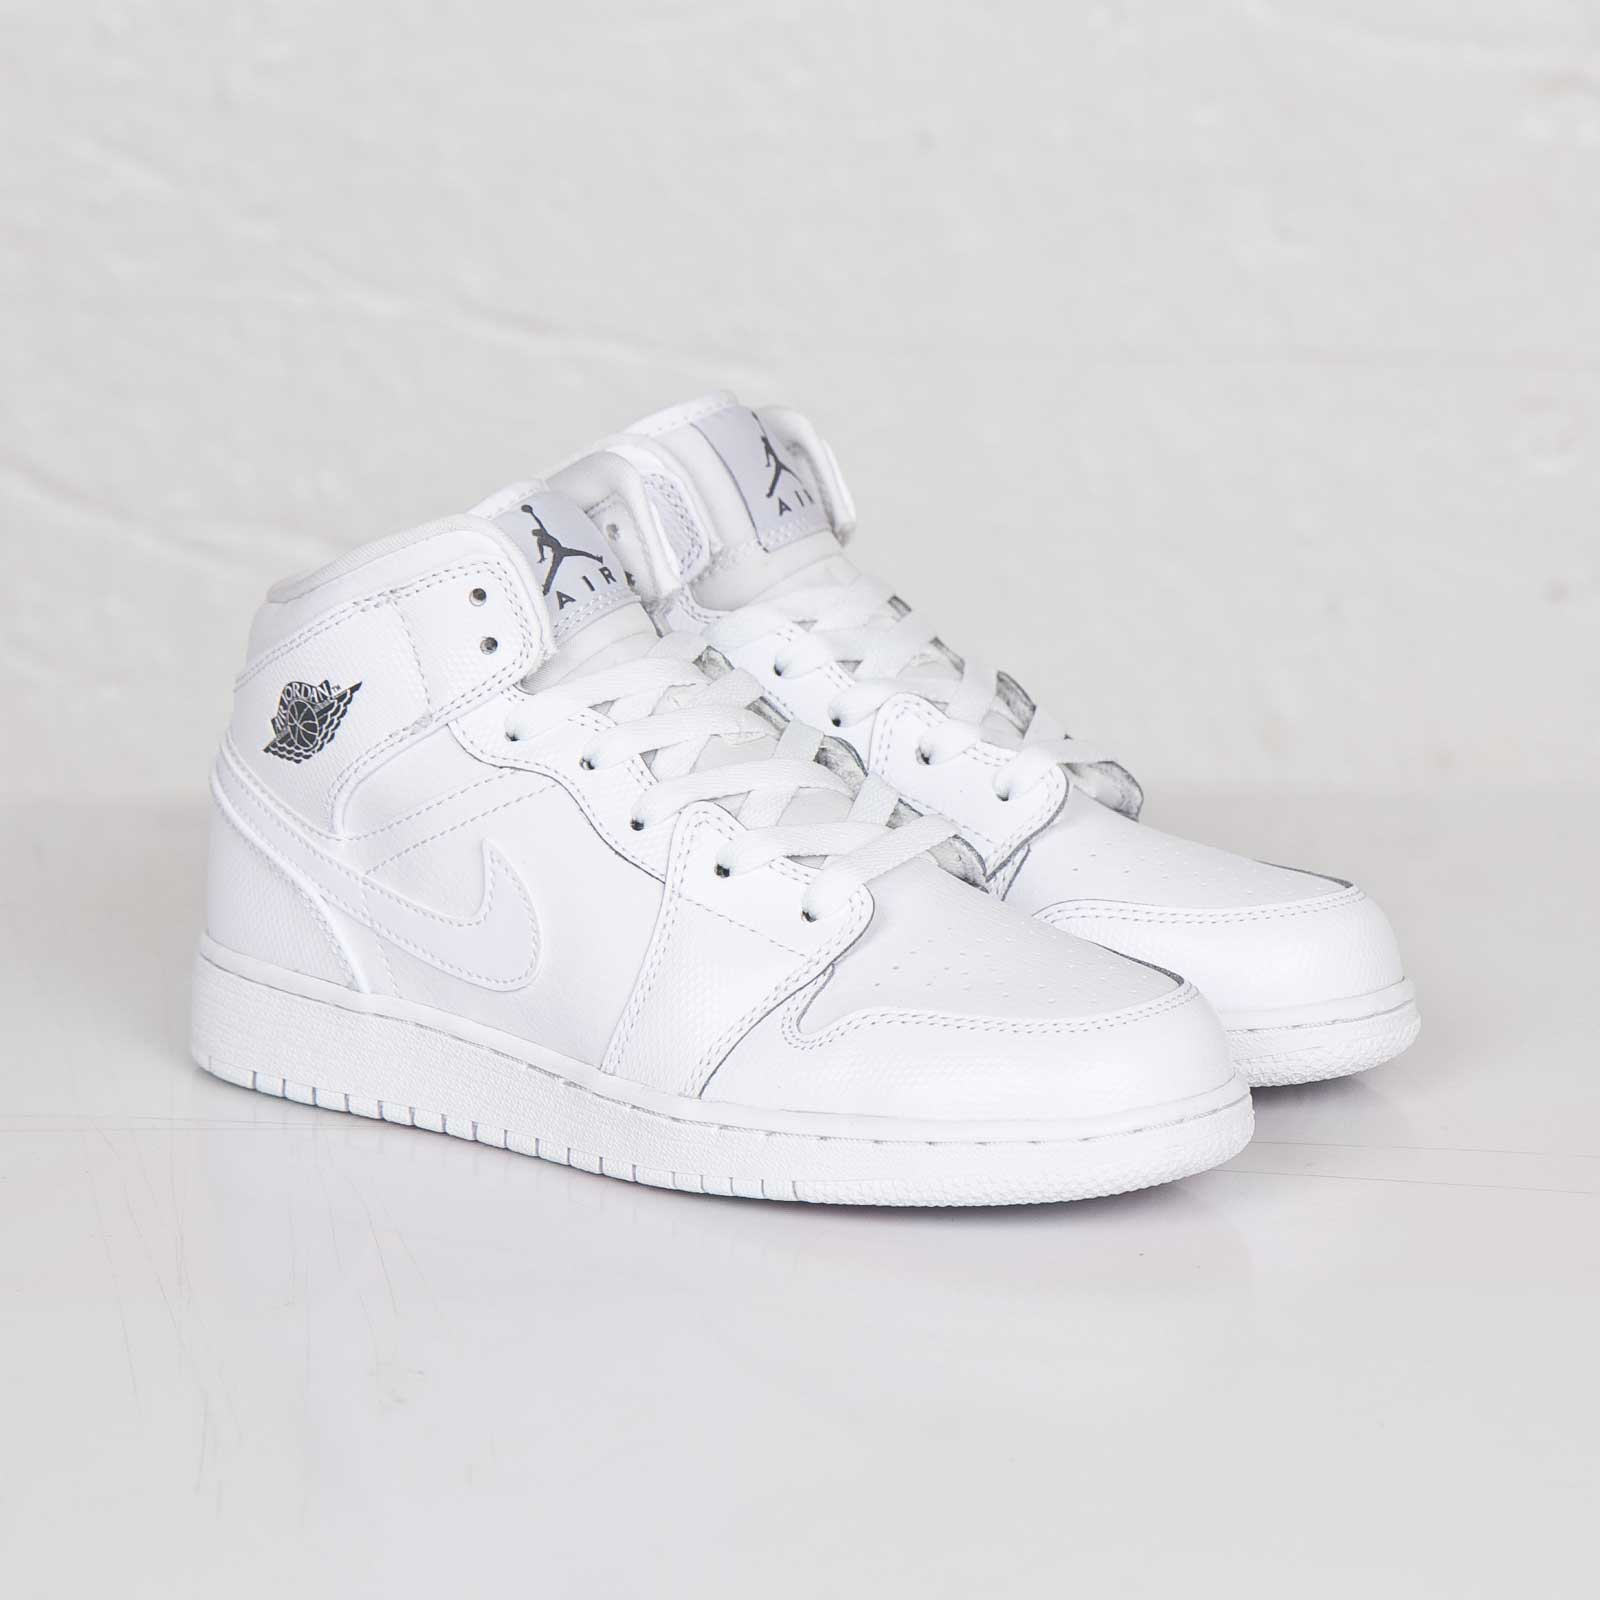 ea3b608621e Jordan Brand Air Jordan 1 Mid (GS) - 554725-120 - Sneakersnstuff ...